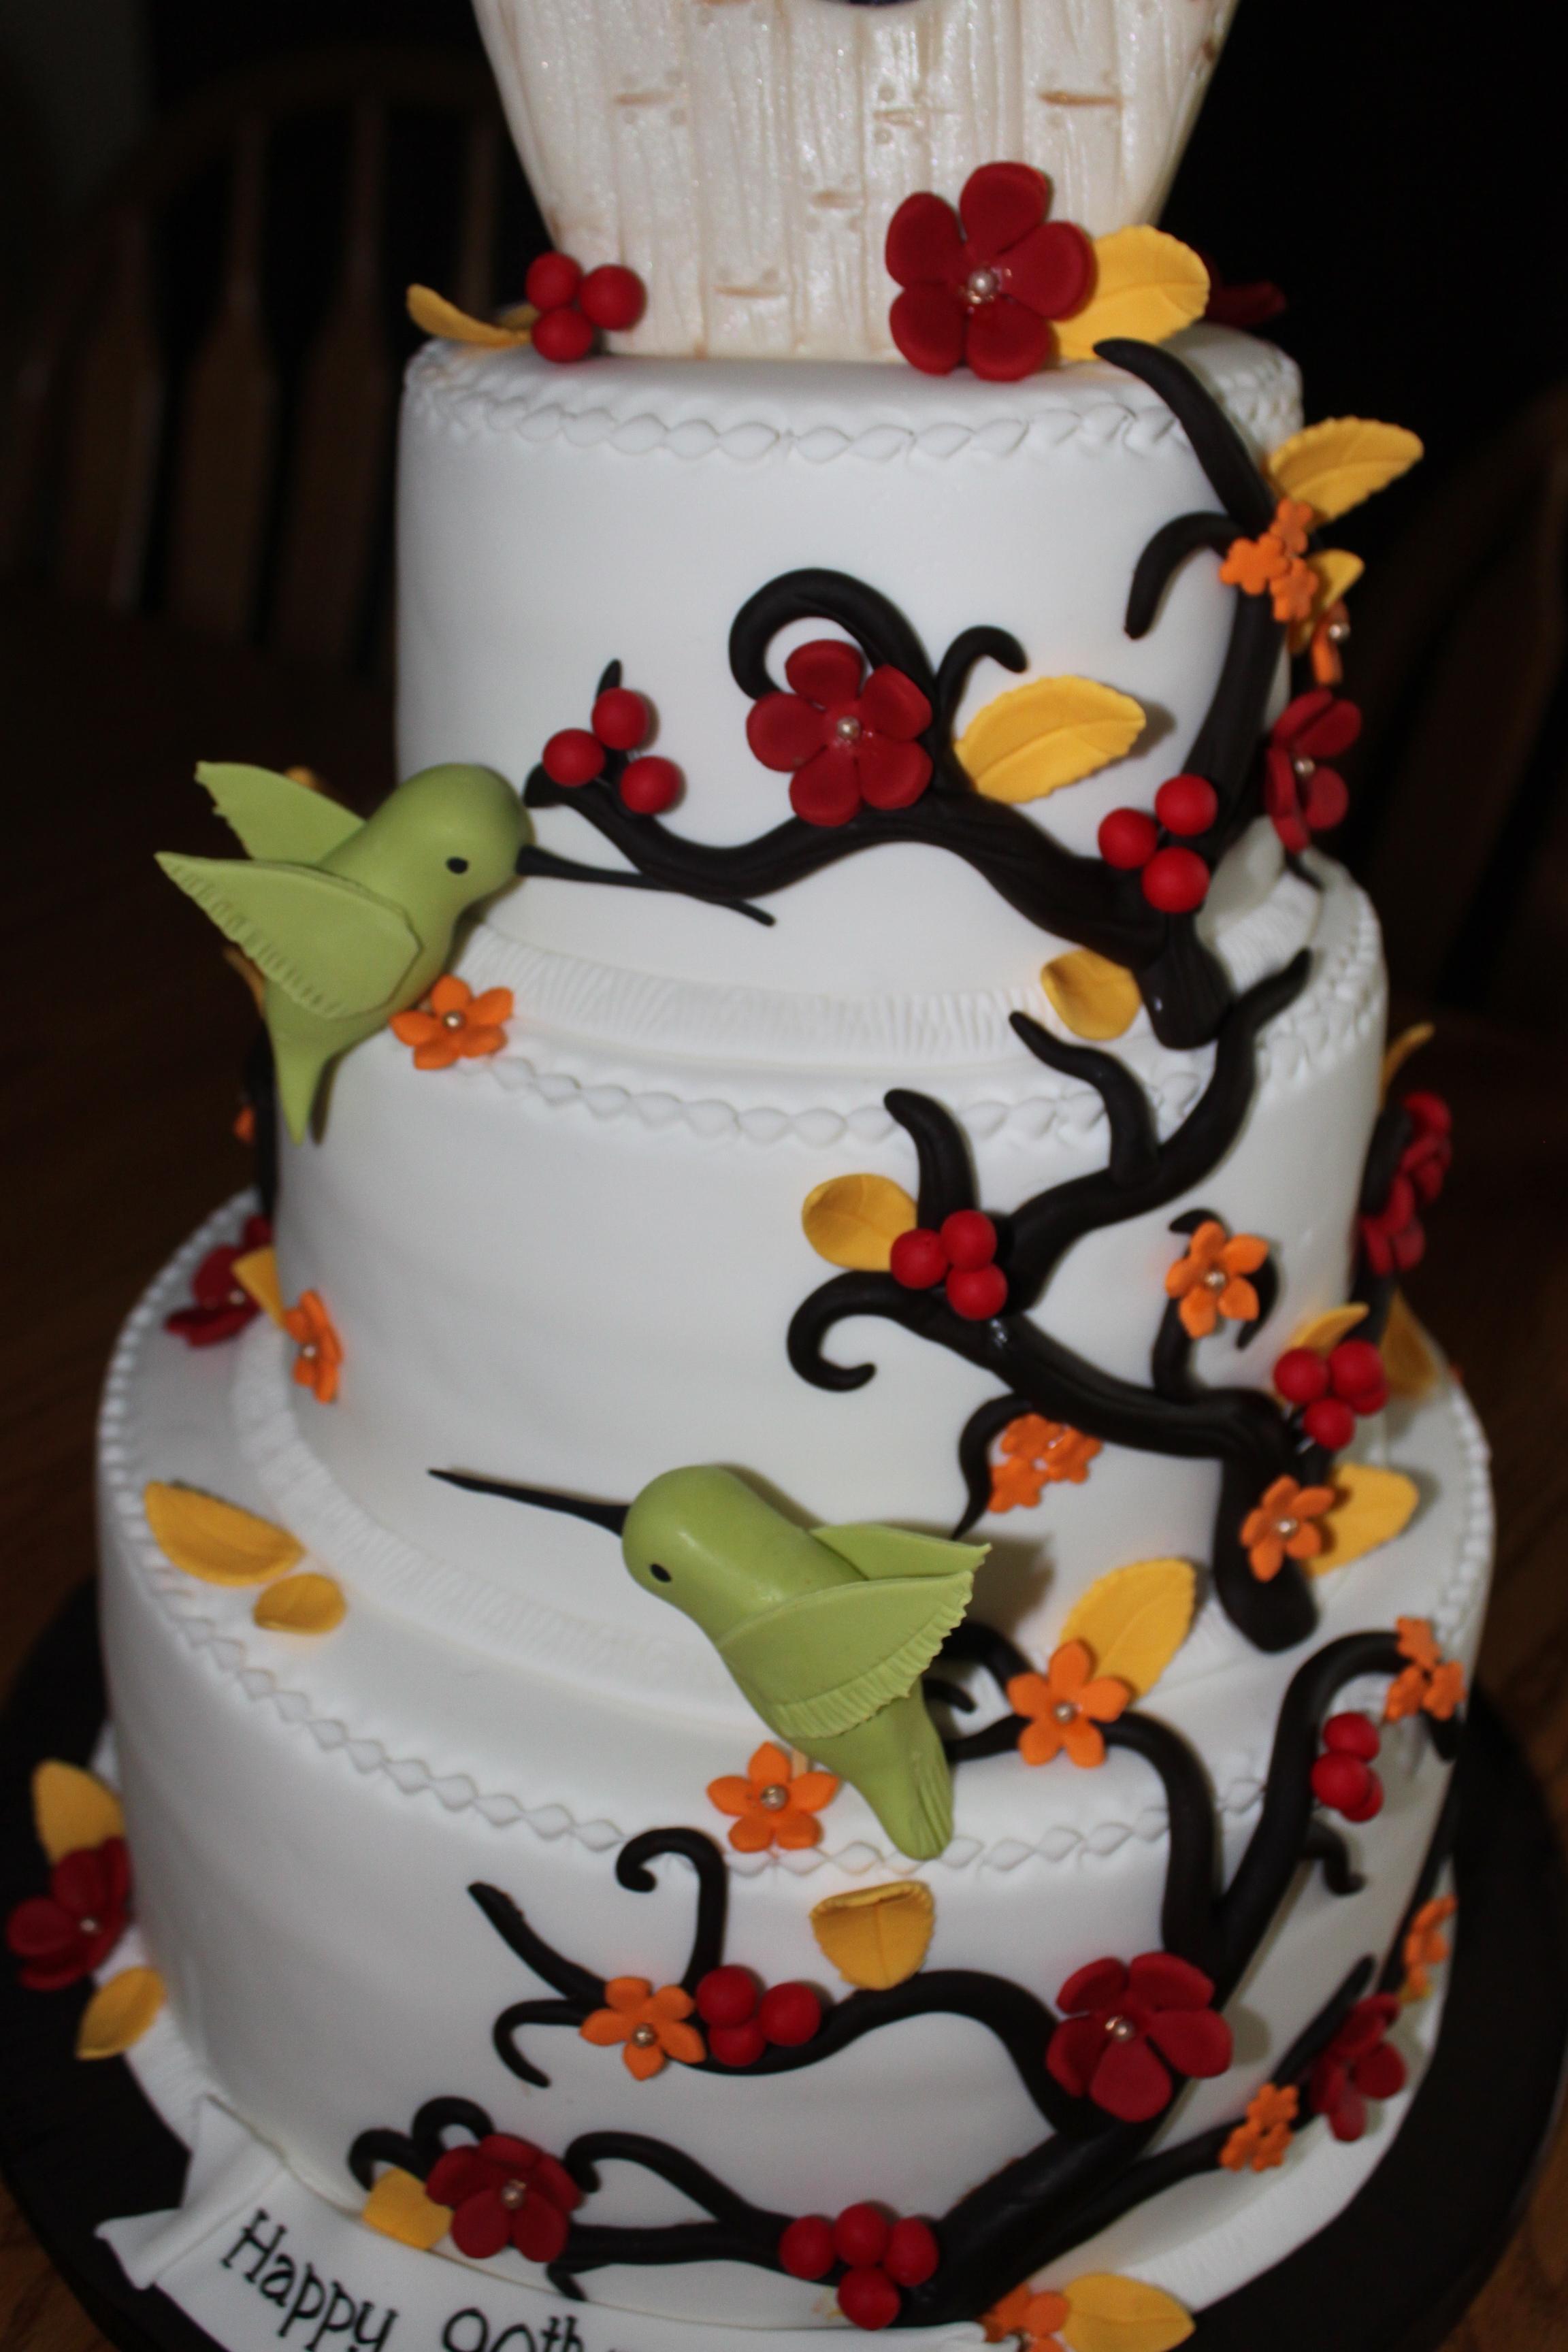 LC White Birthday Cake - recipe courtesy George Stella